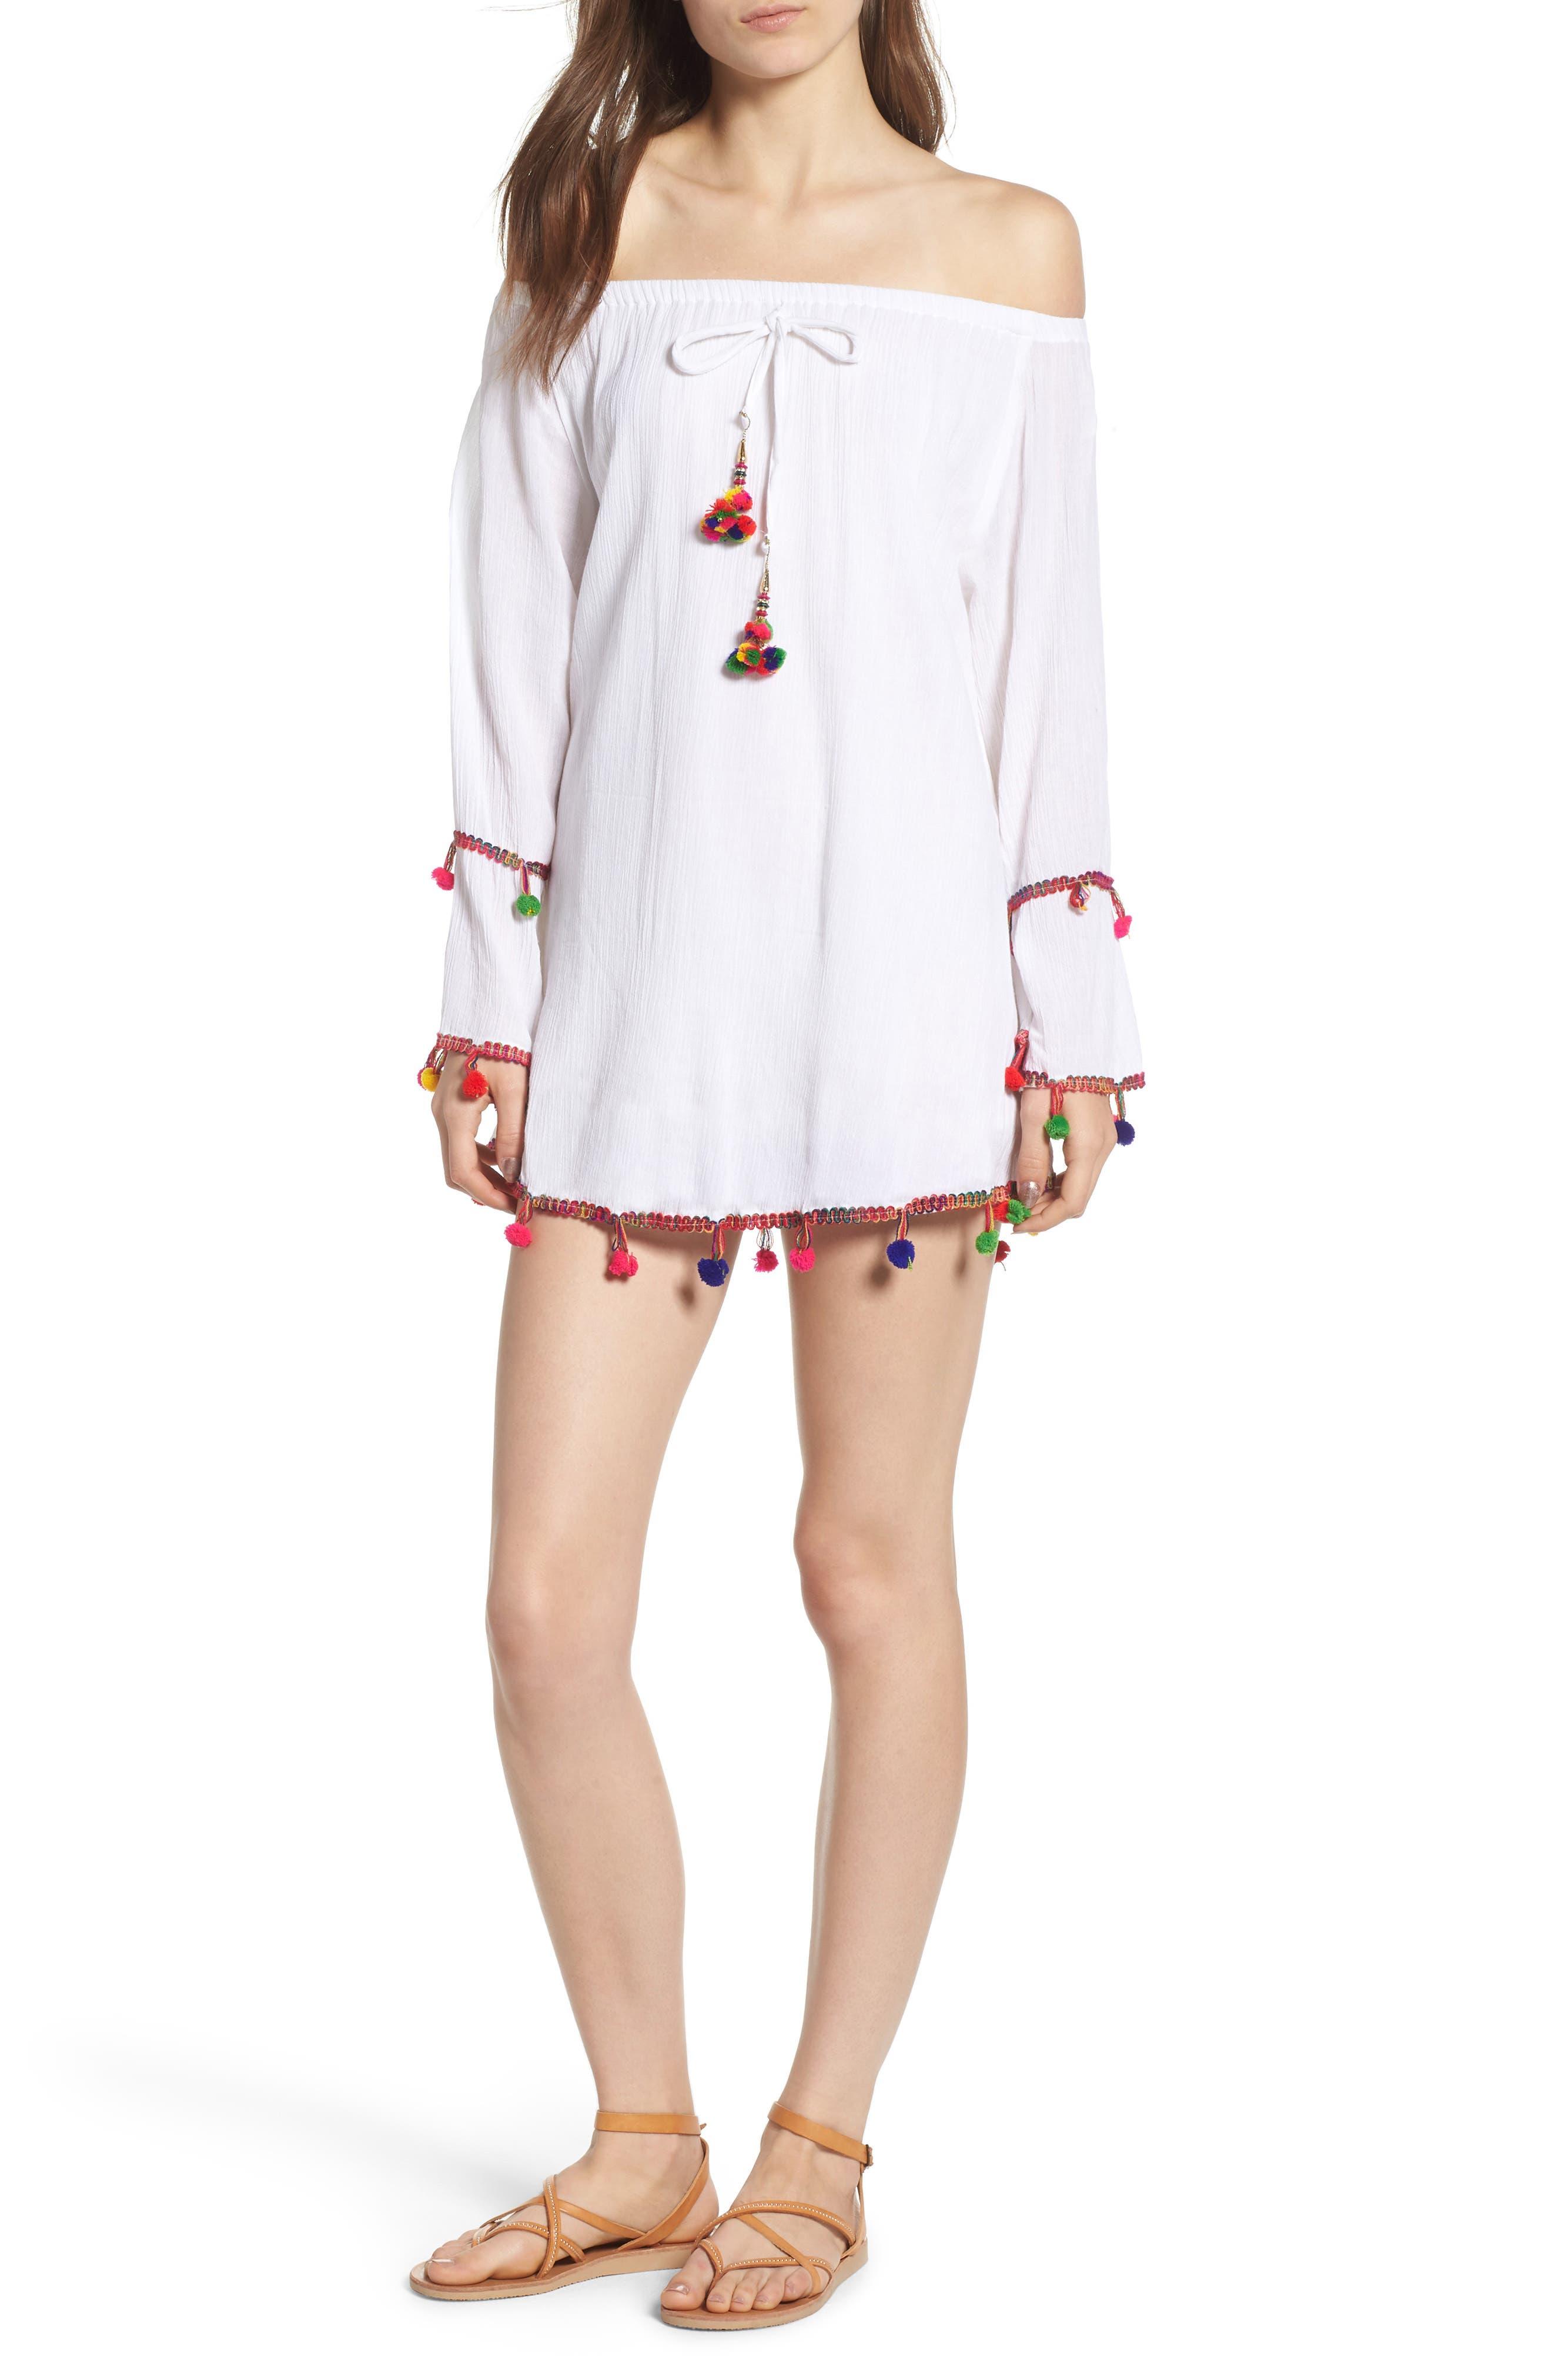 RAGA HAVANA DAZE POMPOM OFF THE SHOULDER DRESS